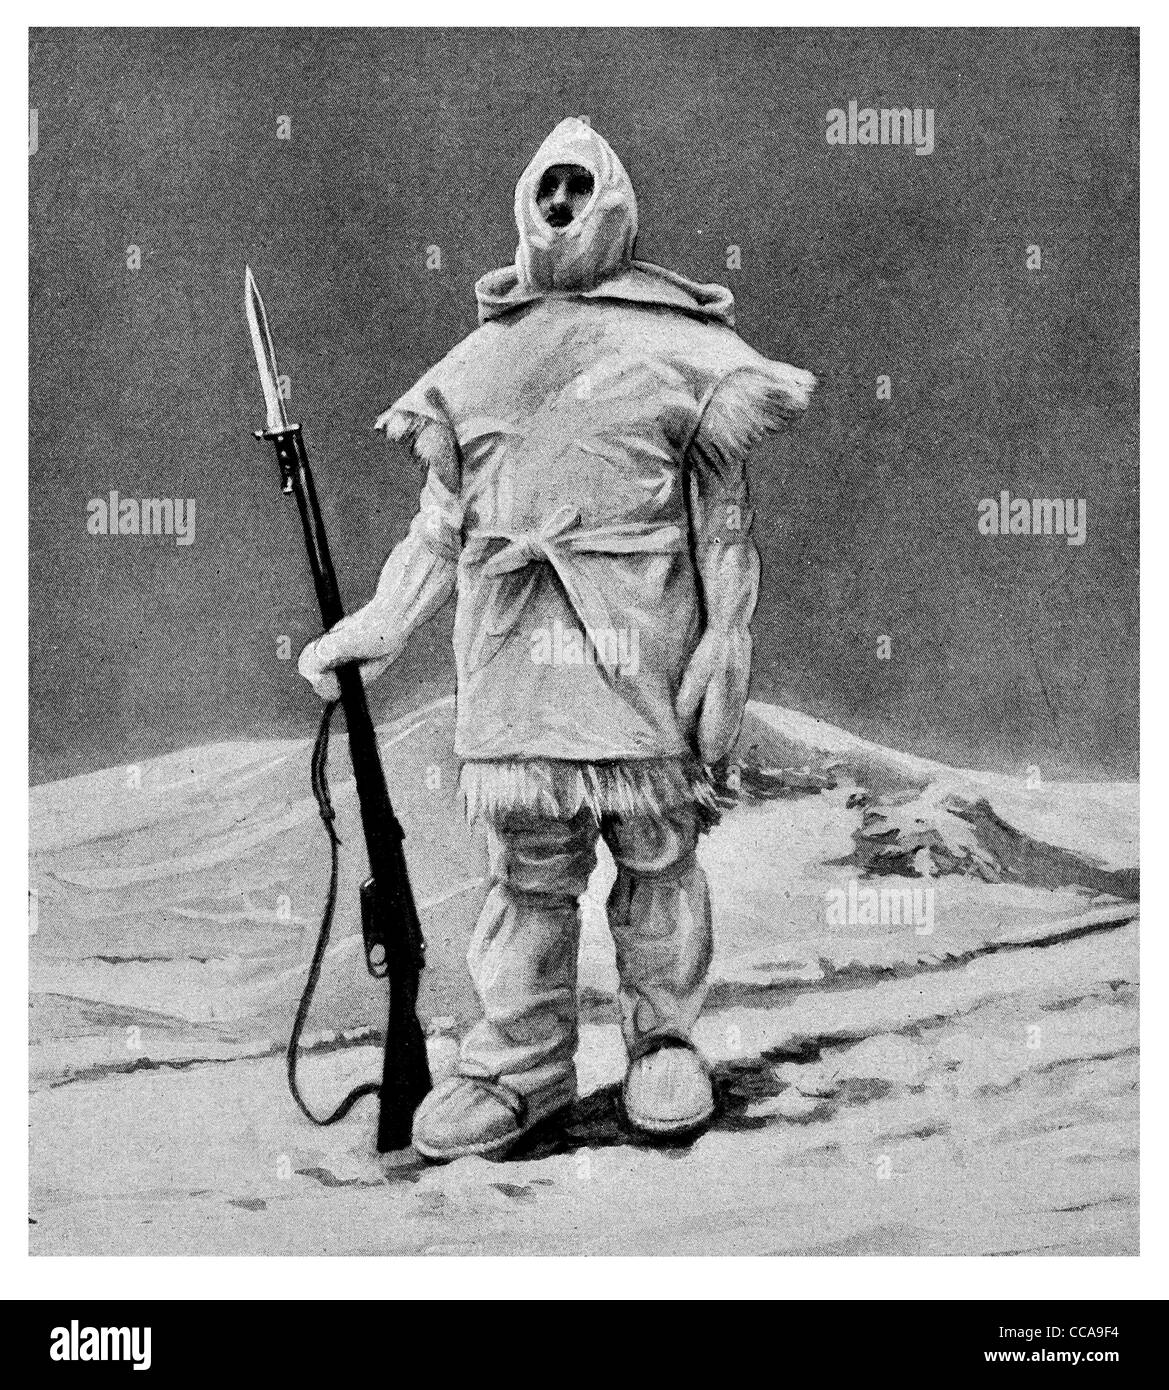 Winter Warfare Stock Photos & Winter Warfare Stock Images - Alamy